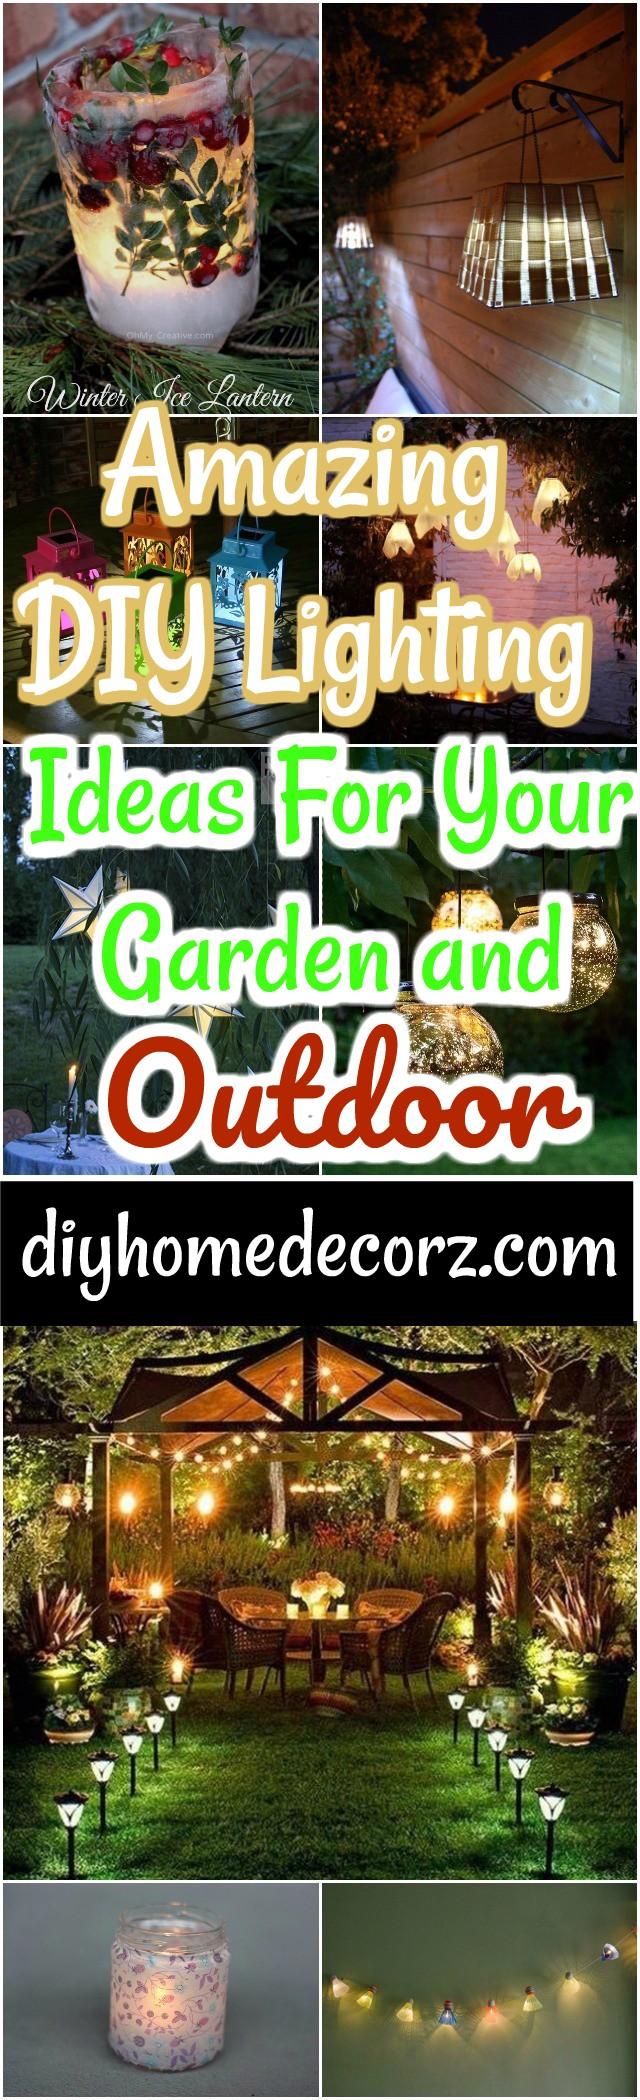 DIY Lighting Ideas -